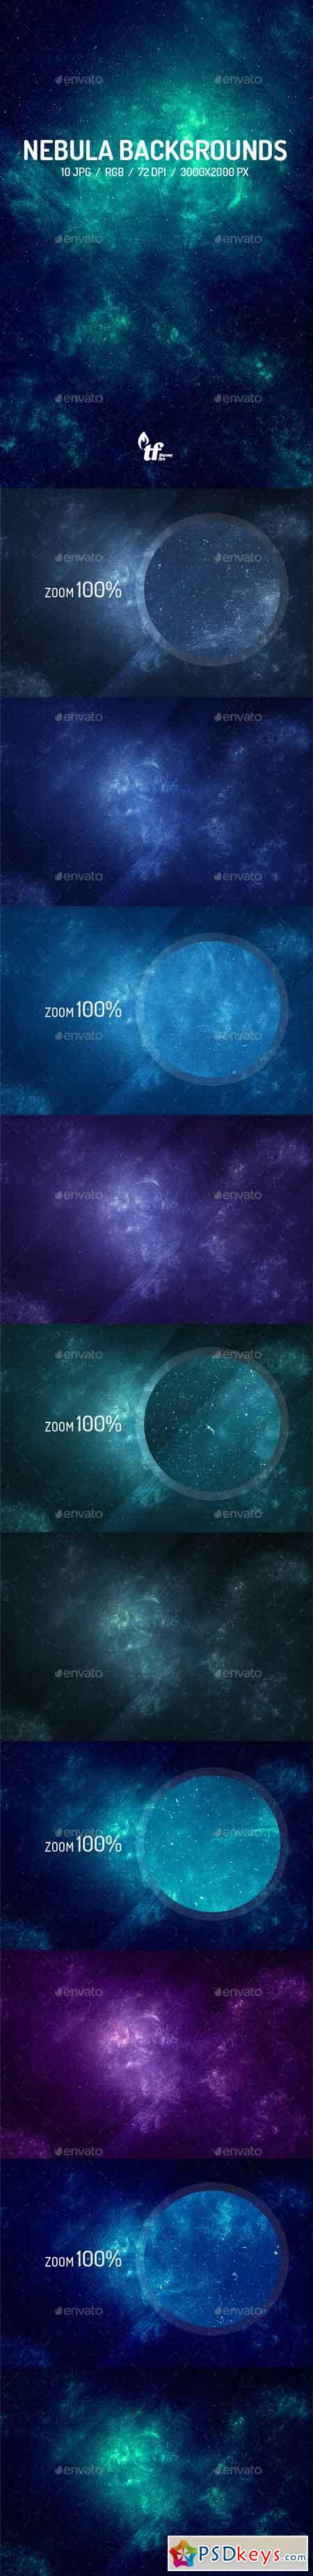 10 Nebula Backgrounds 9647294